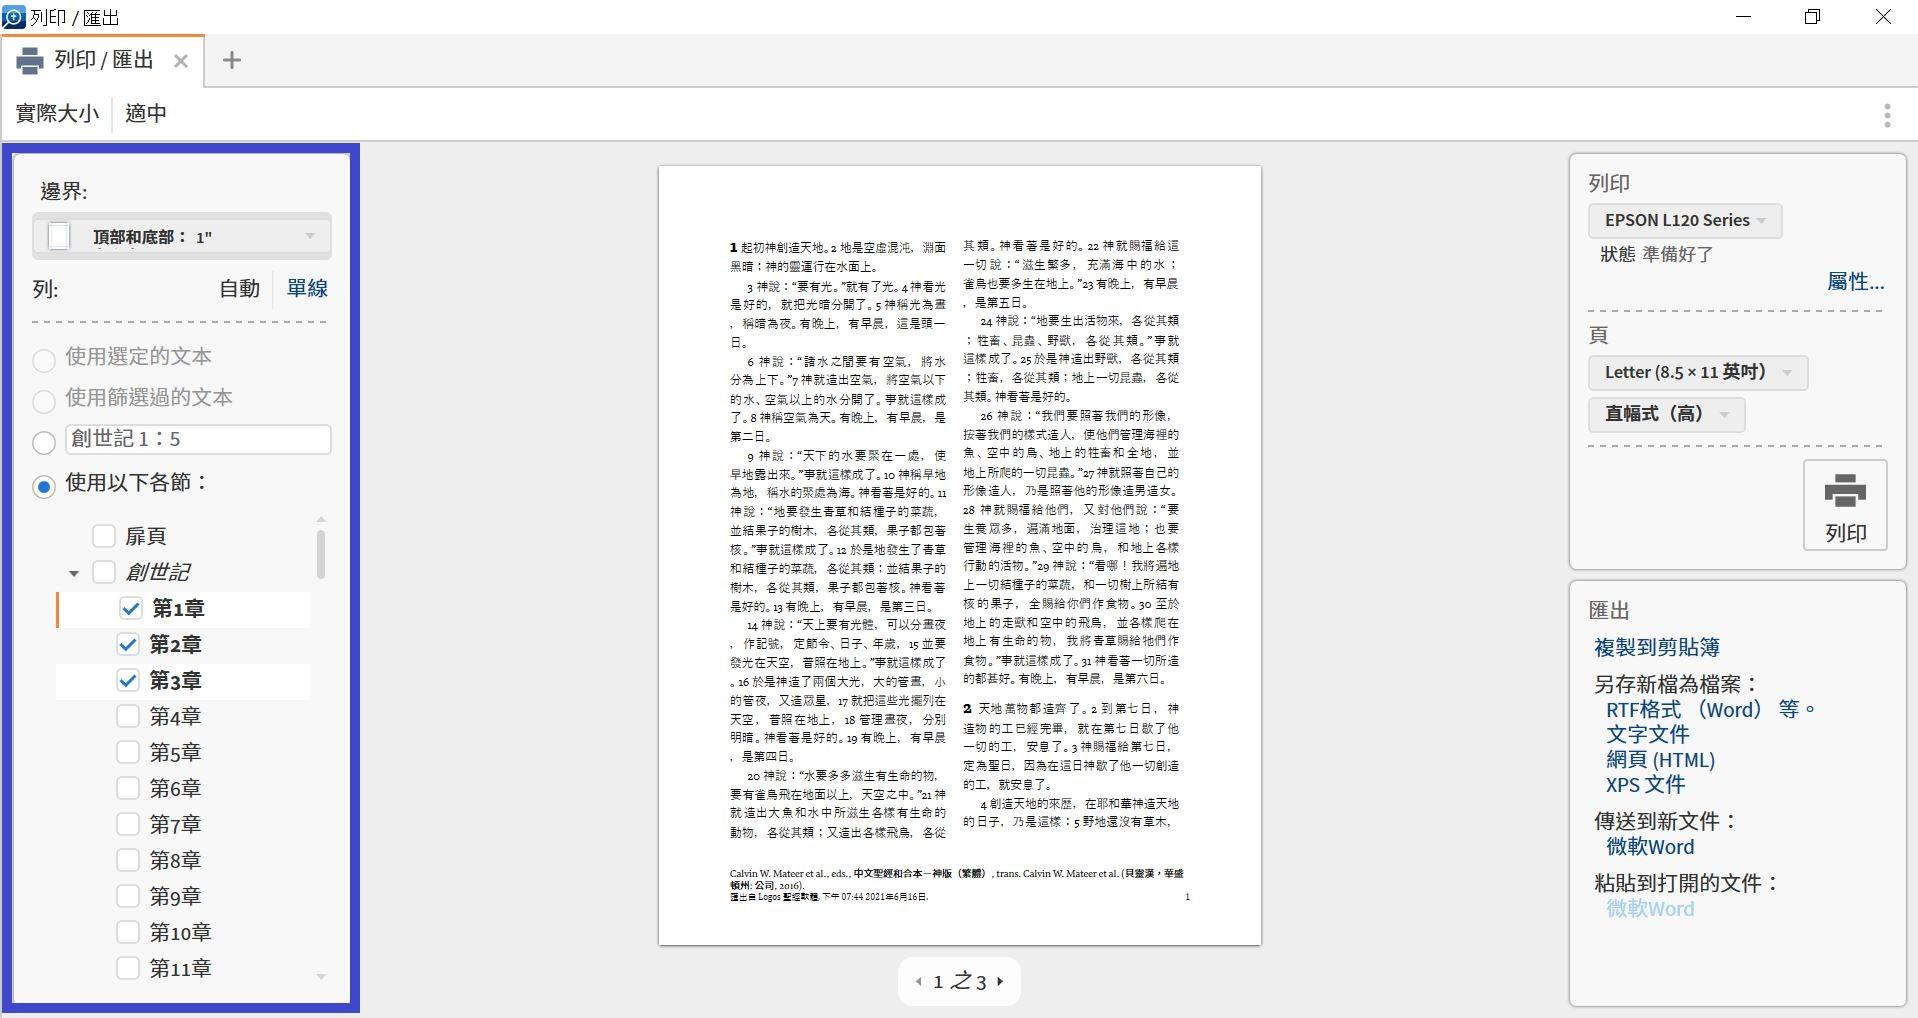 Screen_Shot_2019-09-17_at_1.11.55_PM_copy_1.png